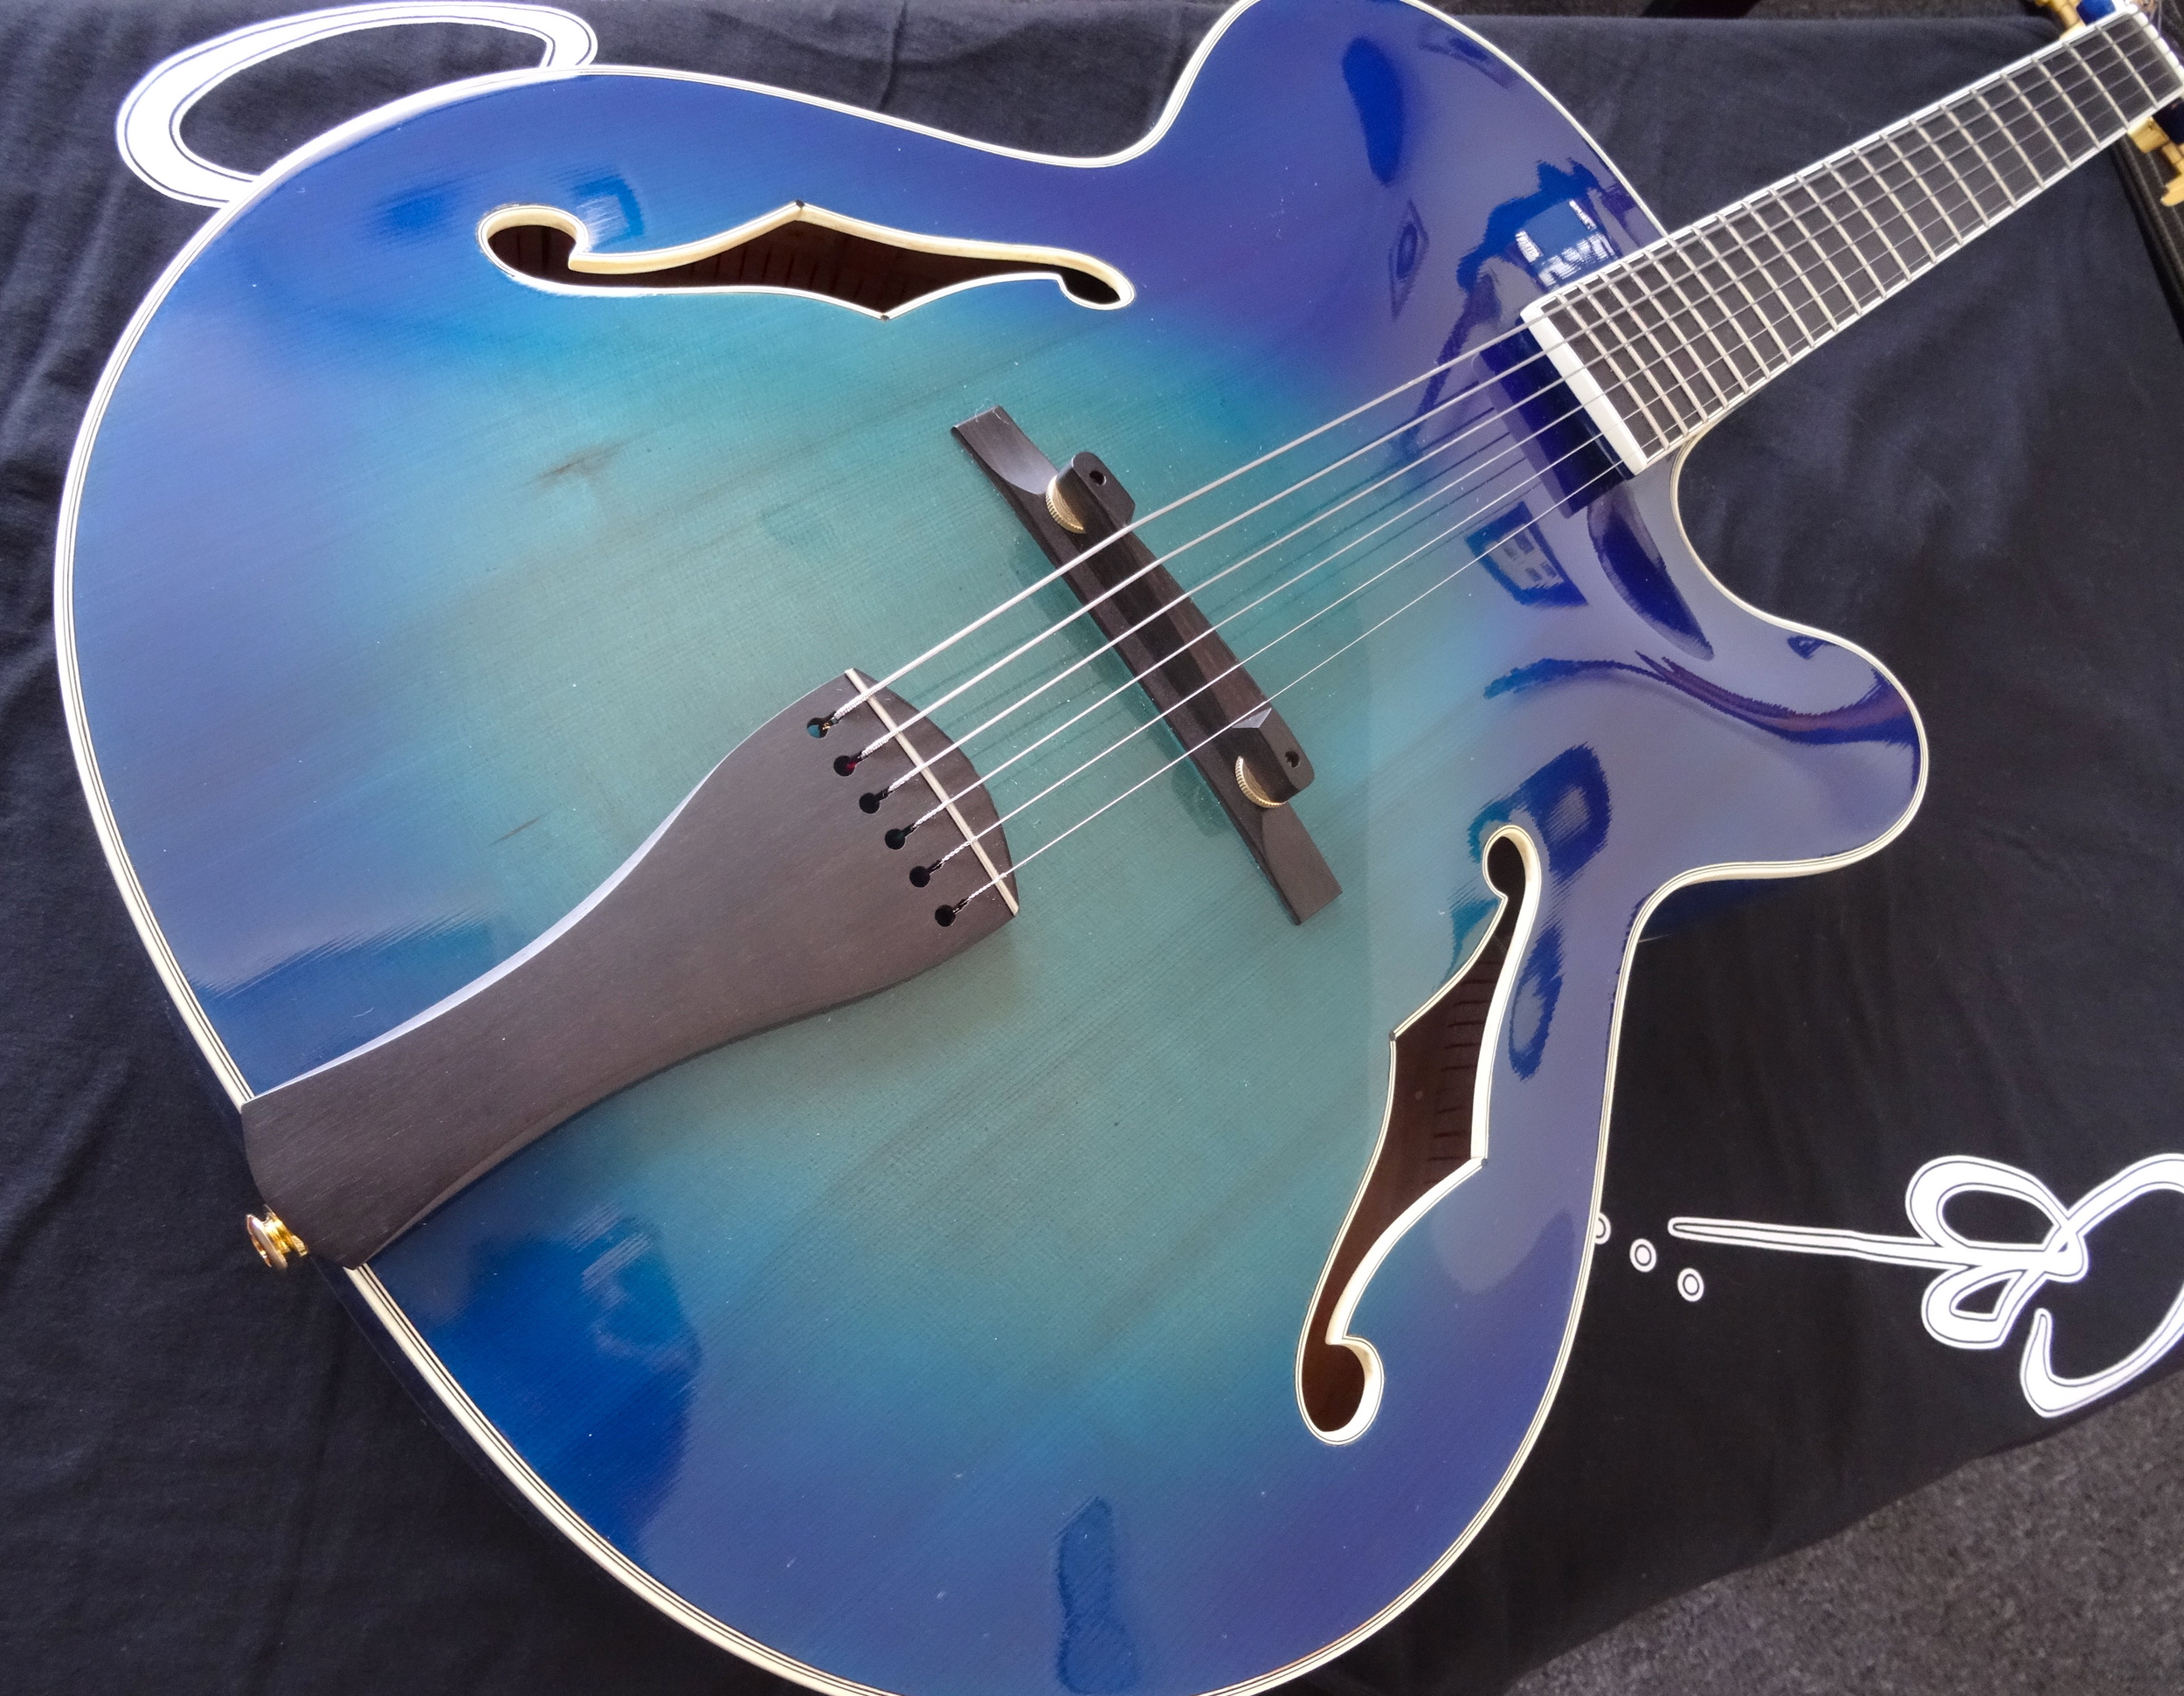 """Big Blue"" 17"" Regatta Archtop  Pre-Owned   $3600  with custom gig bag"